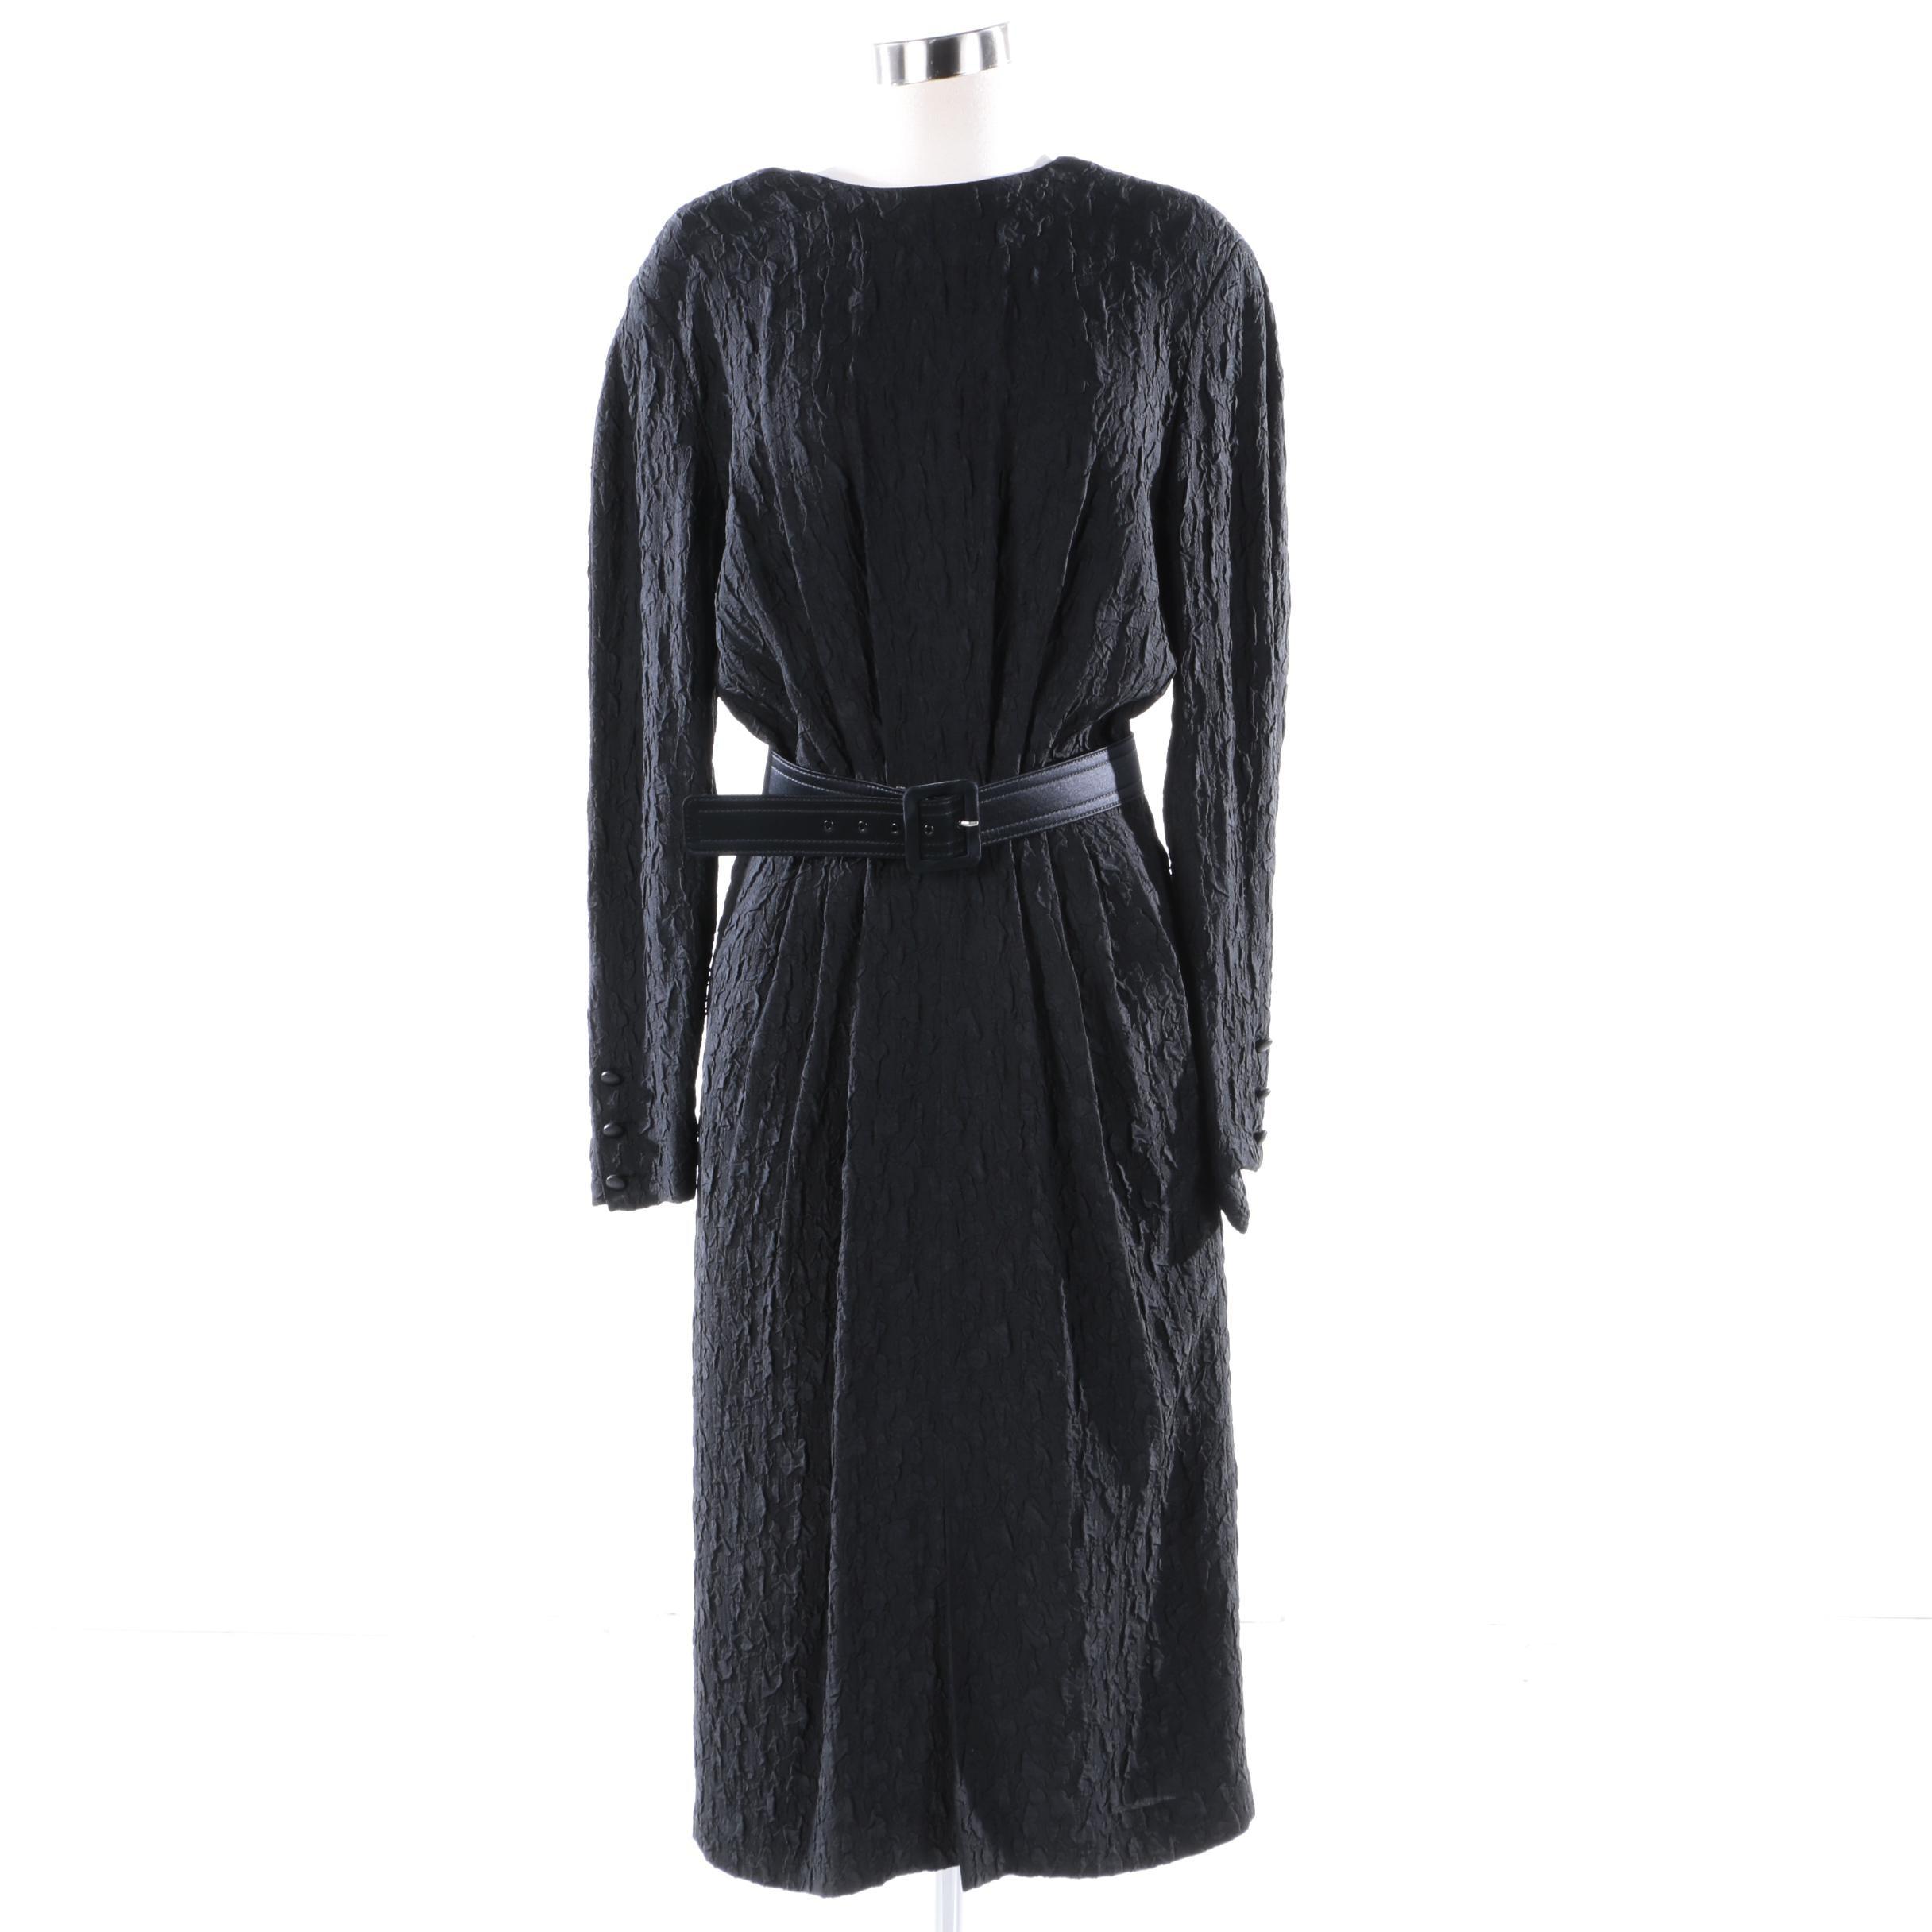 1980s Vintage Escada Silk Blend Black Pleat Evening Dress